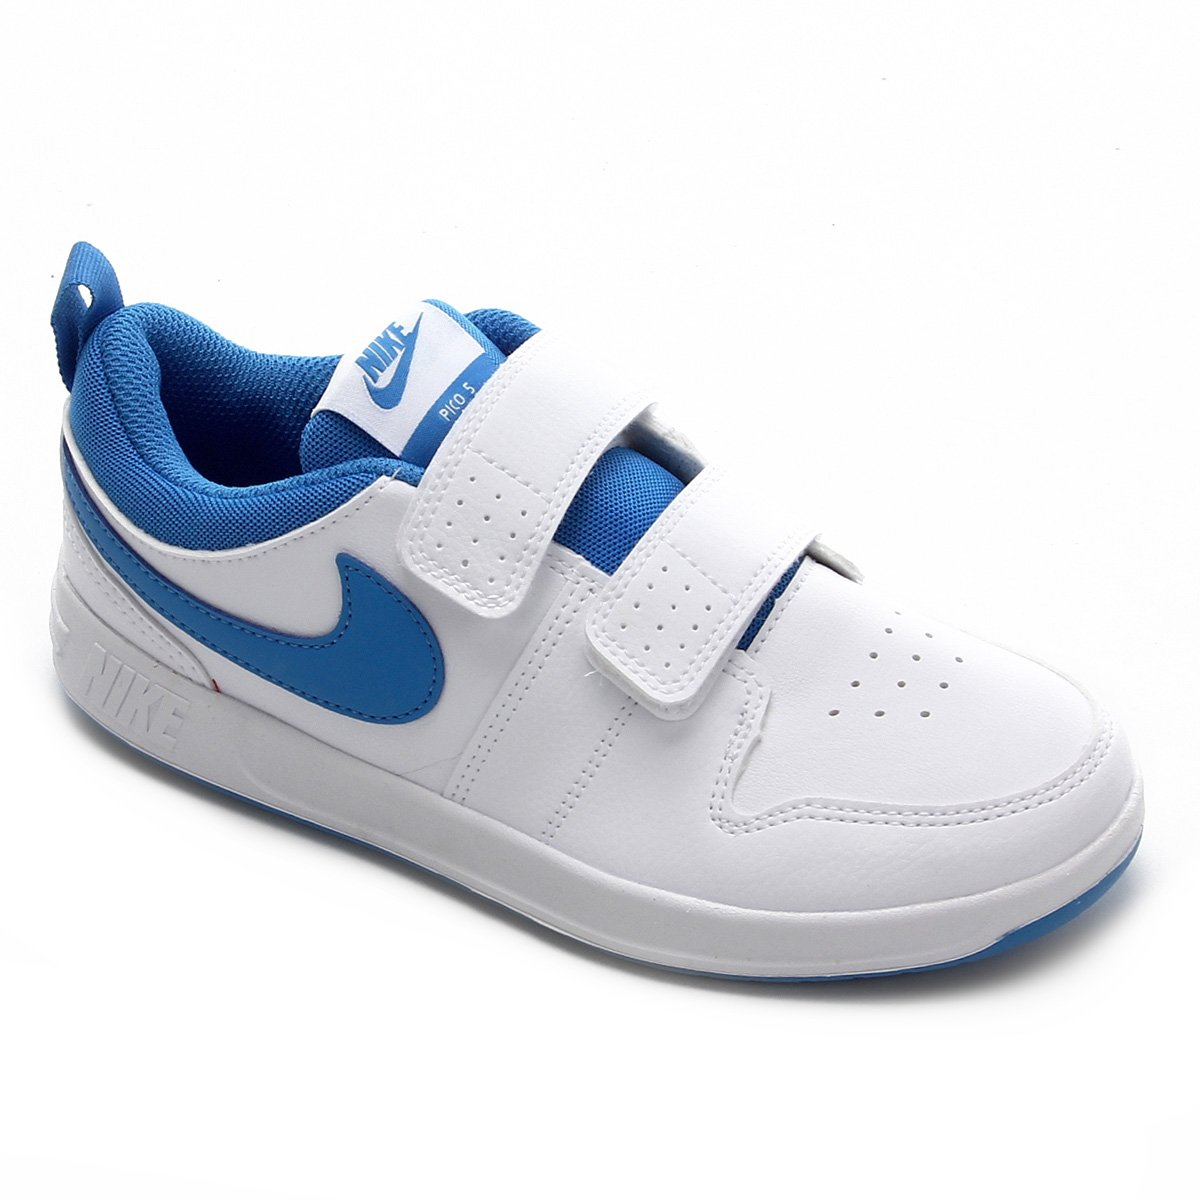 pimienta Porque internacional  Tênis Infantil Nike Pico 5 PSV - Branco e Azul | Zattini